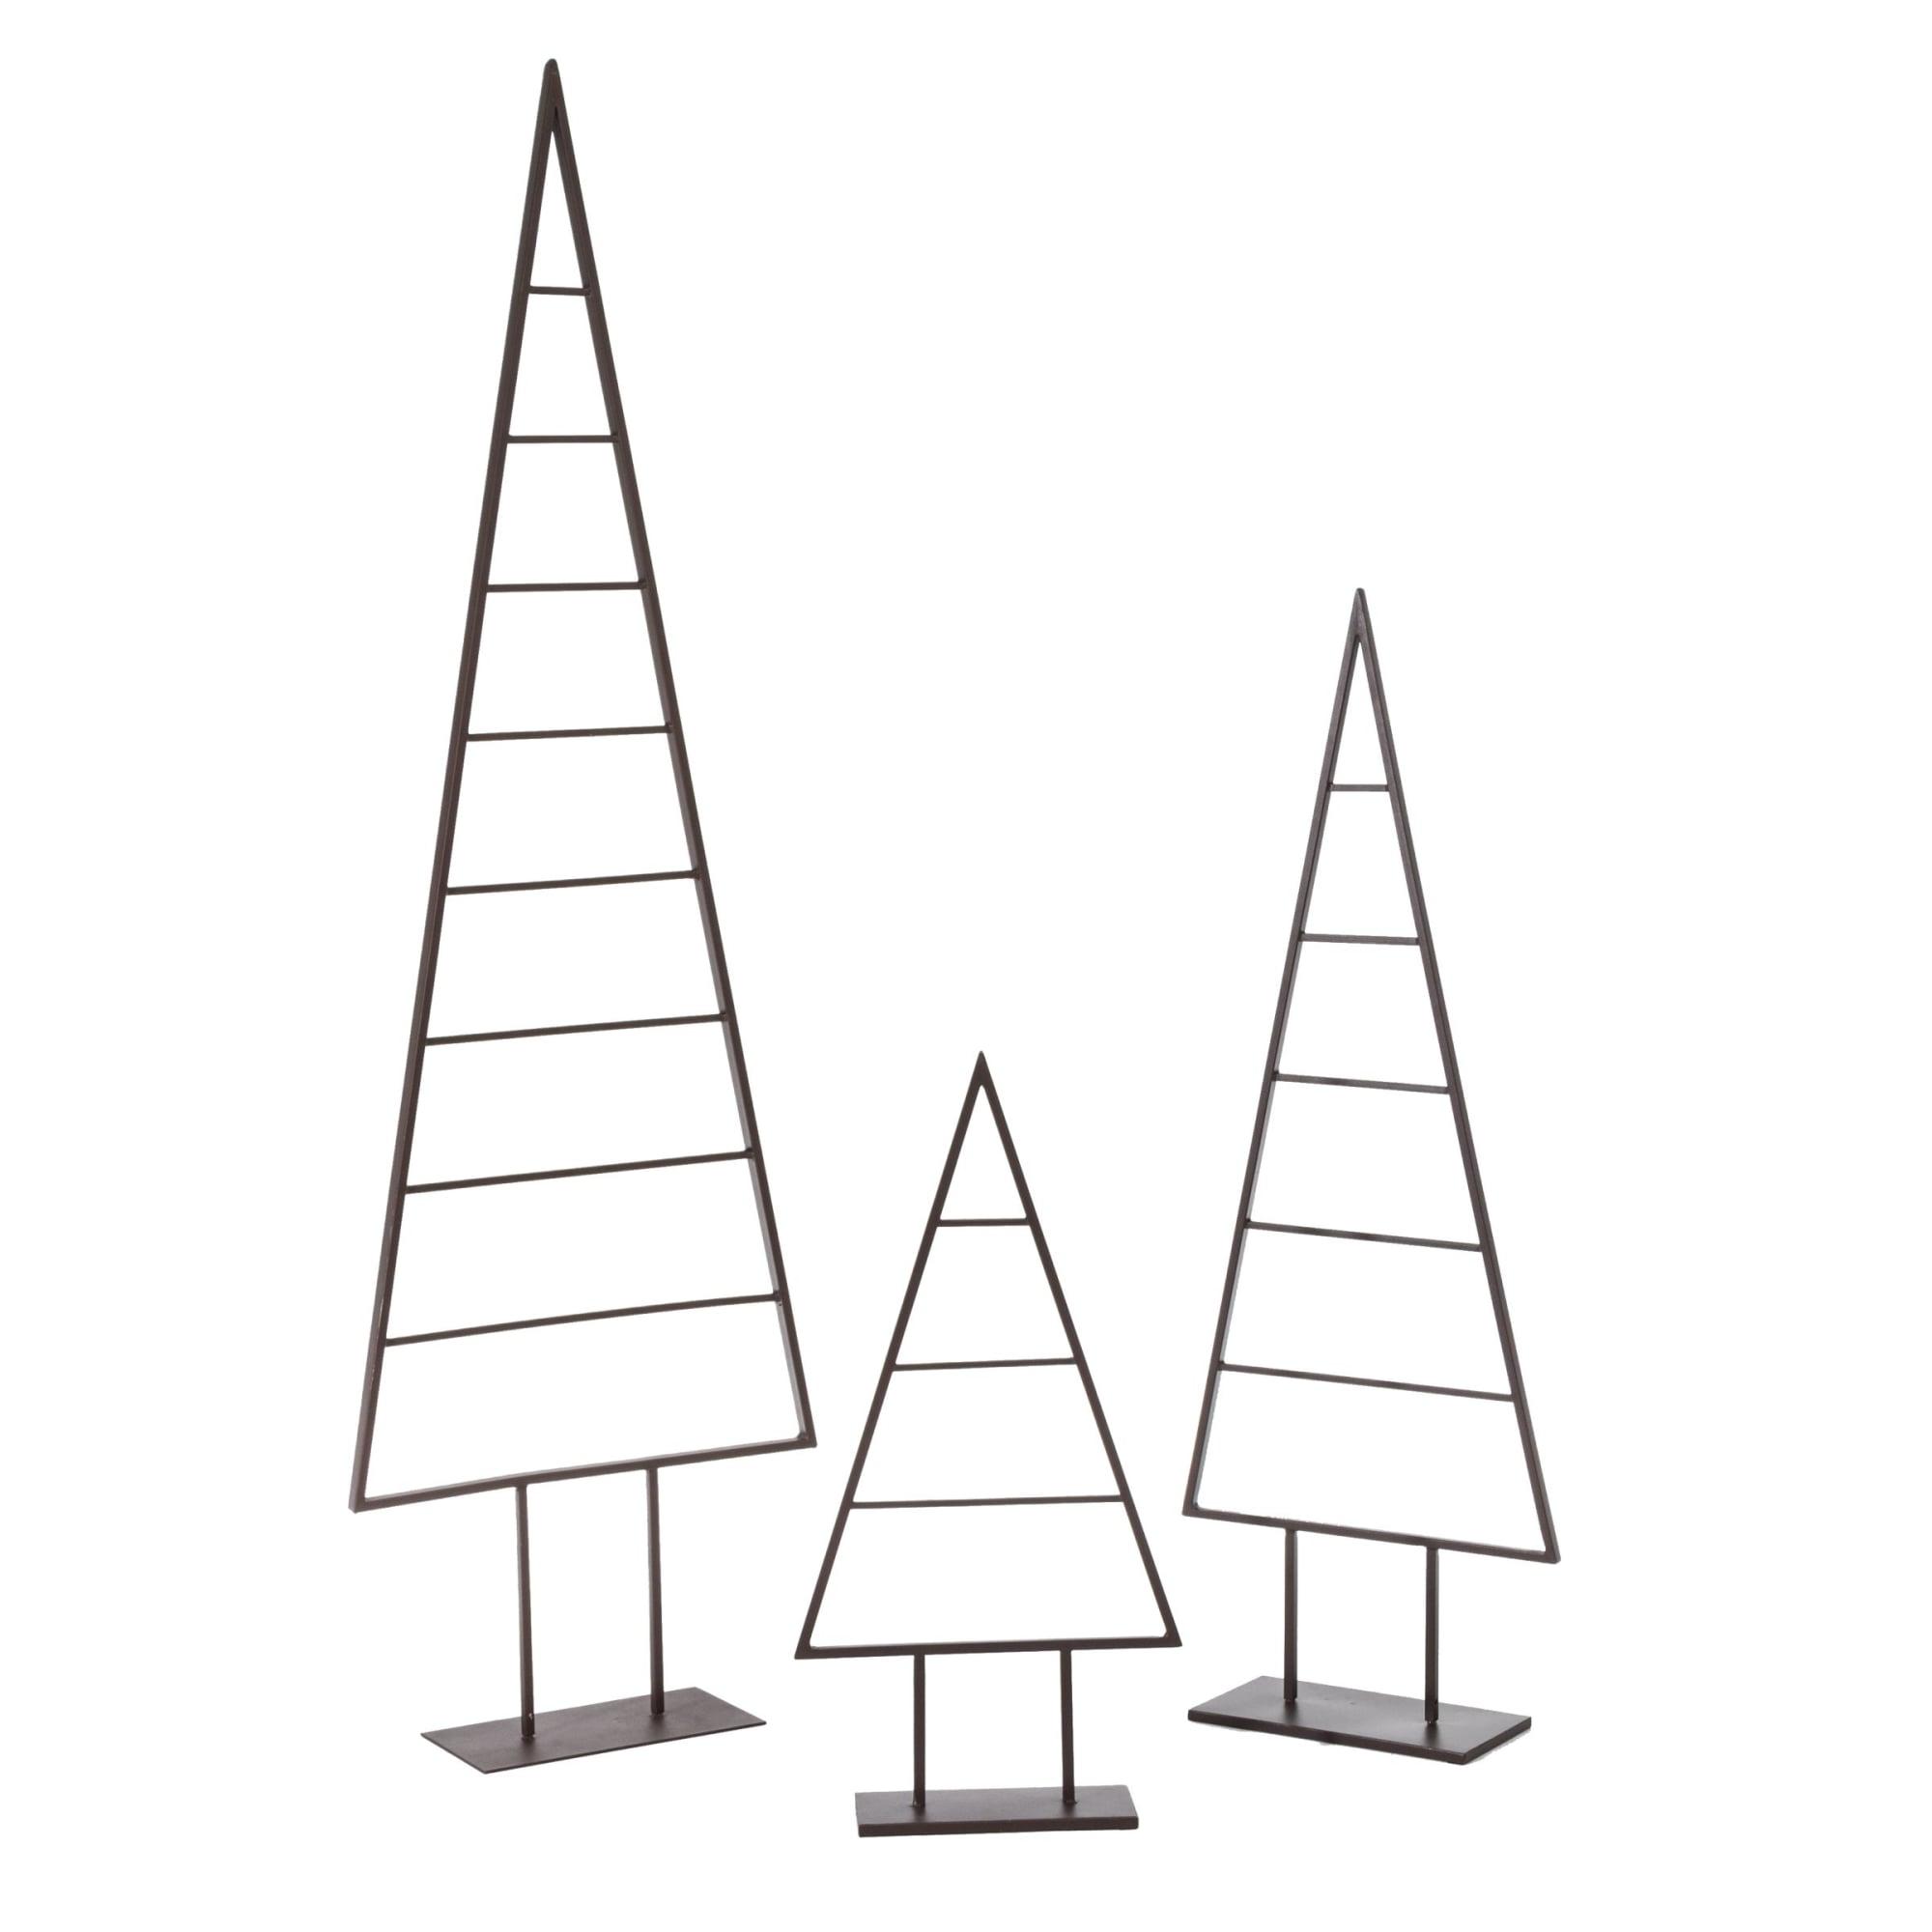 Deko objekt christbaum metall